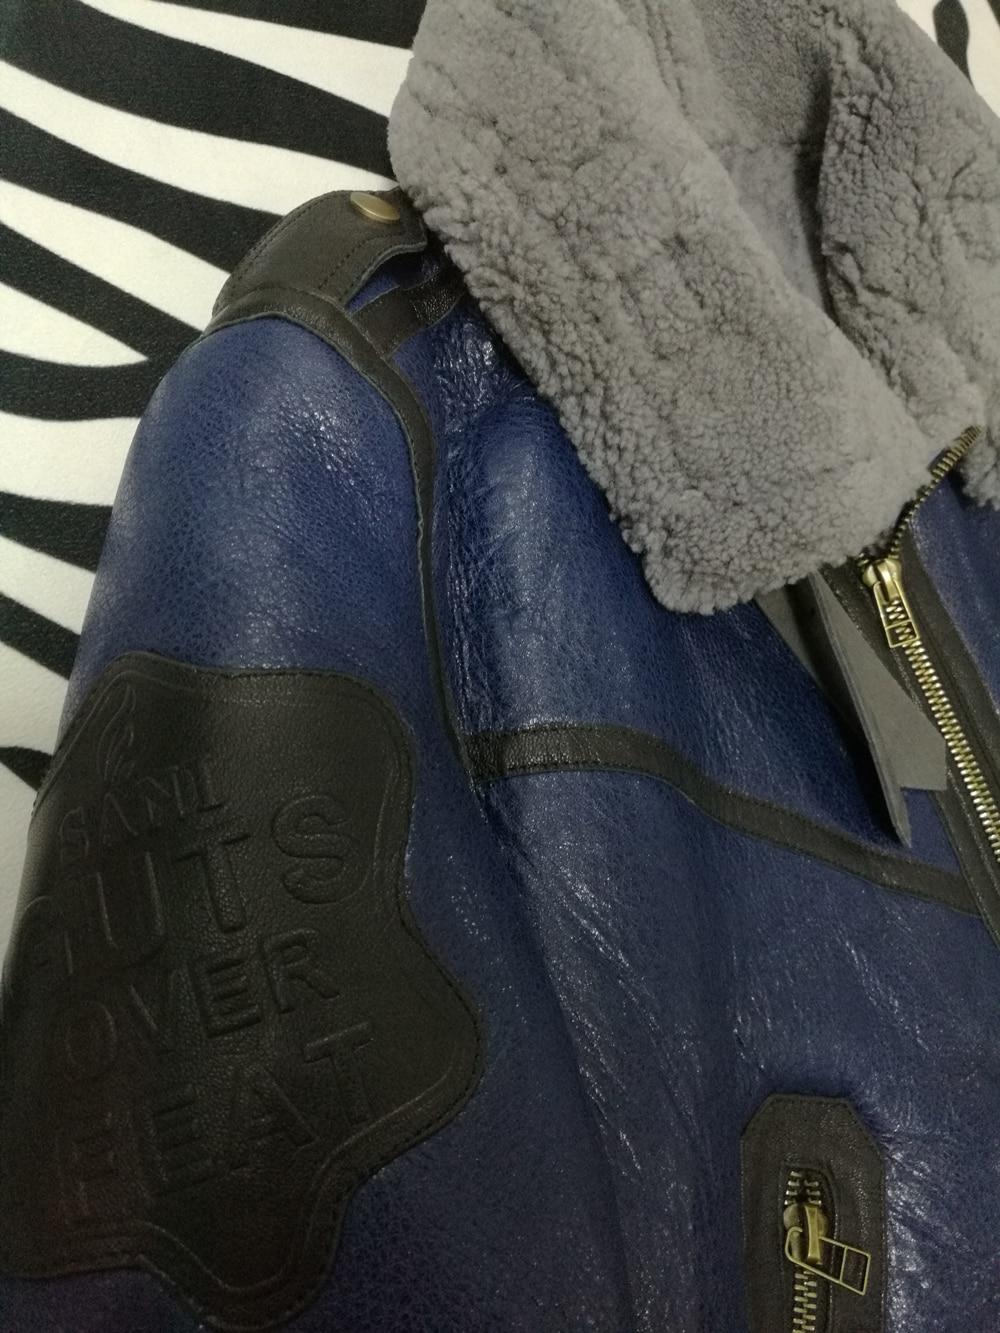 Ha458ff2a2eb5458787c721767a07342aS 2019 Fashion 100% Quality Real Sheepskin Fur Men Coat Genuine Full Pelt Sheep Shearling Male Winter Jacket Brown Men Fur Outwear